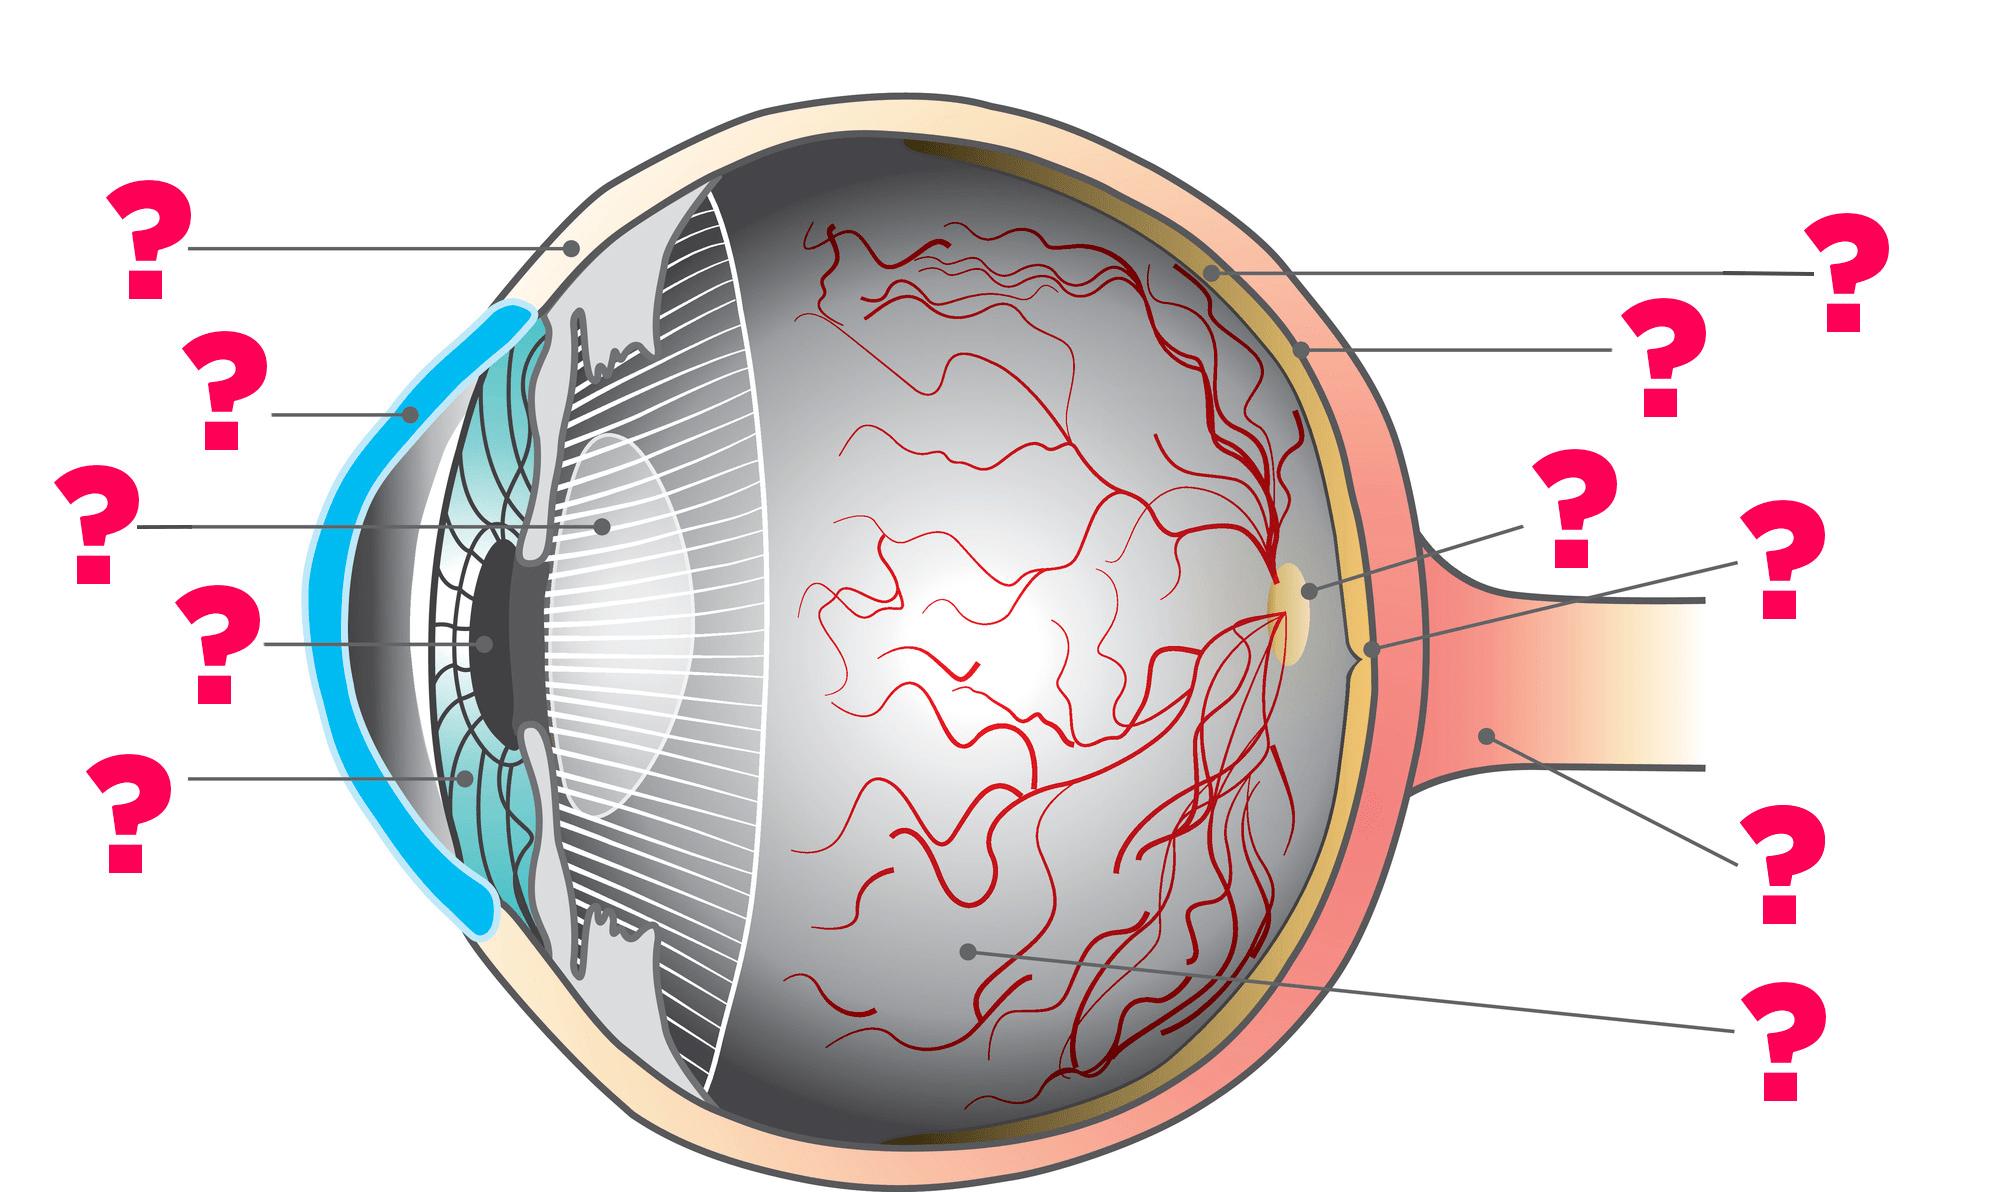 hight resolution of eye diagram quiz game ngs wiring diagram cerebral cortex diagram quiz can you get 11 11